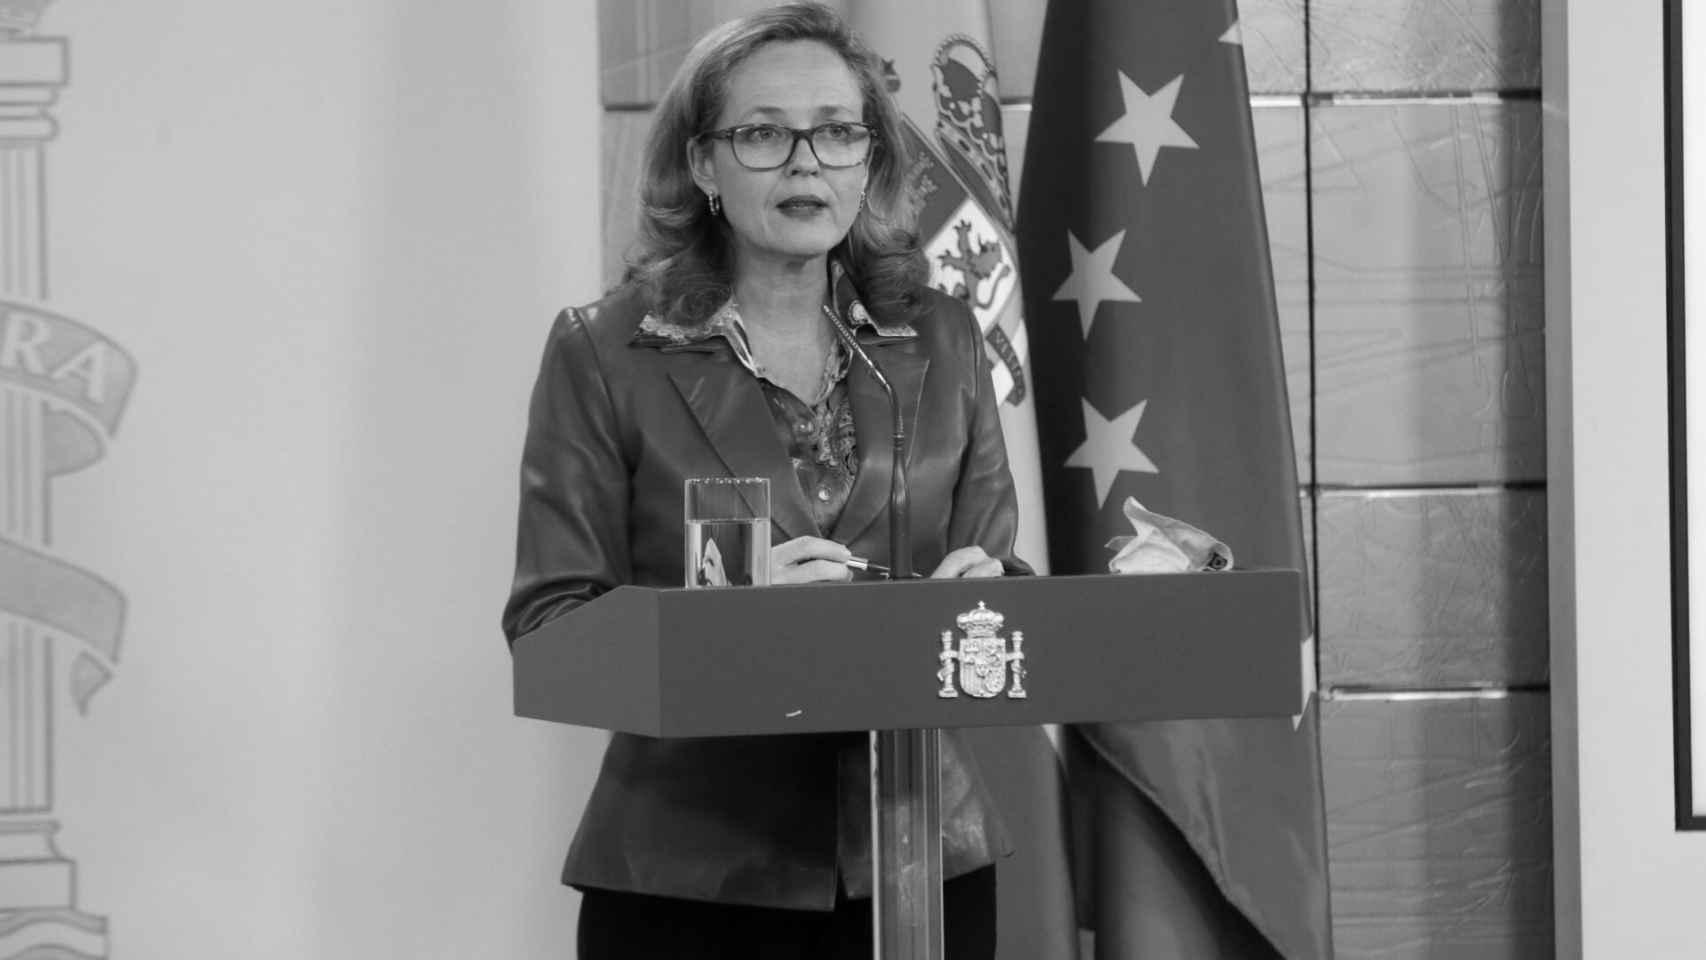 La vicepresidenta del Gobierno, Nadia Calviño.